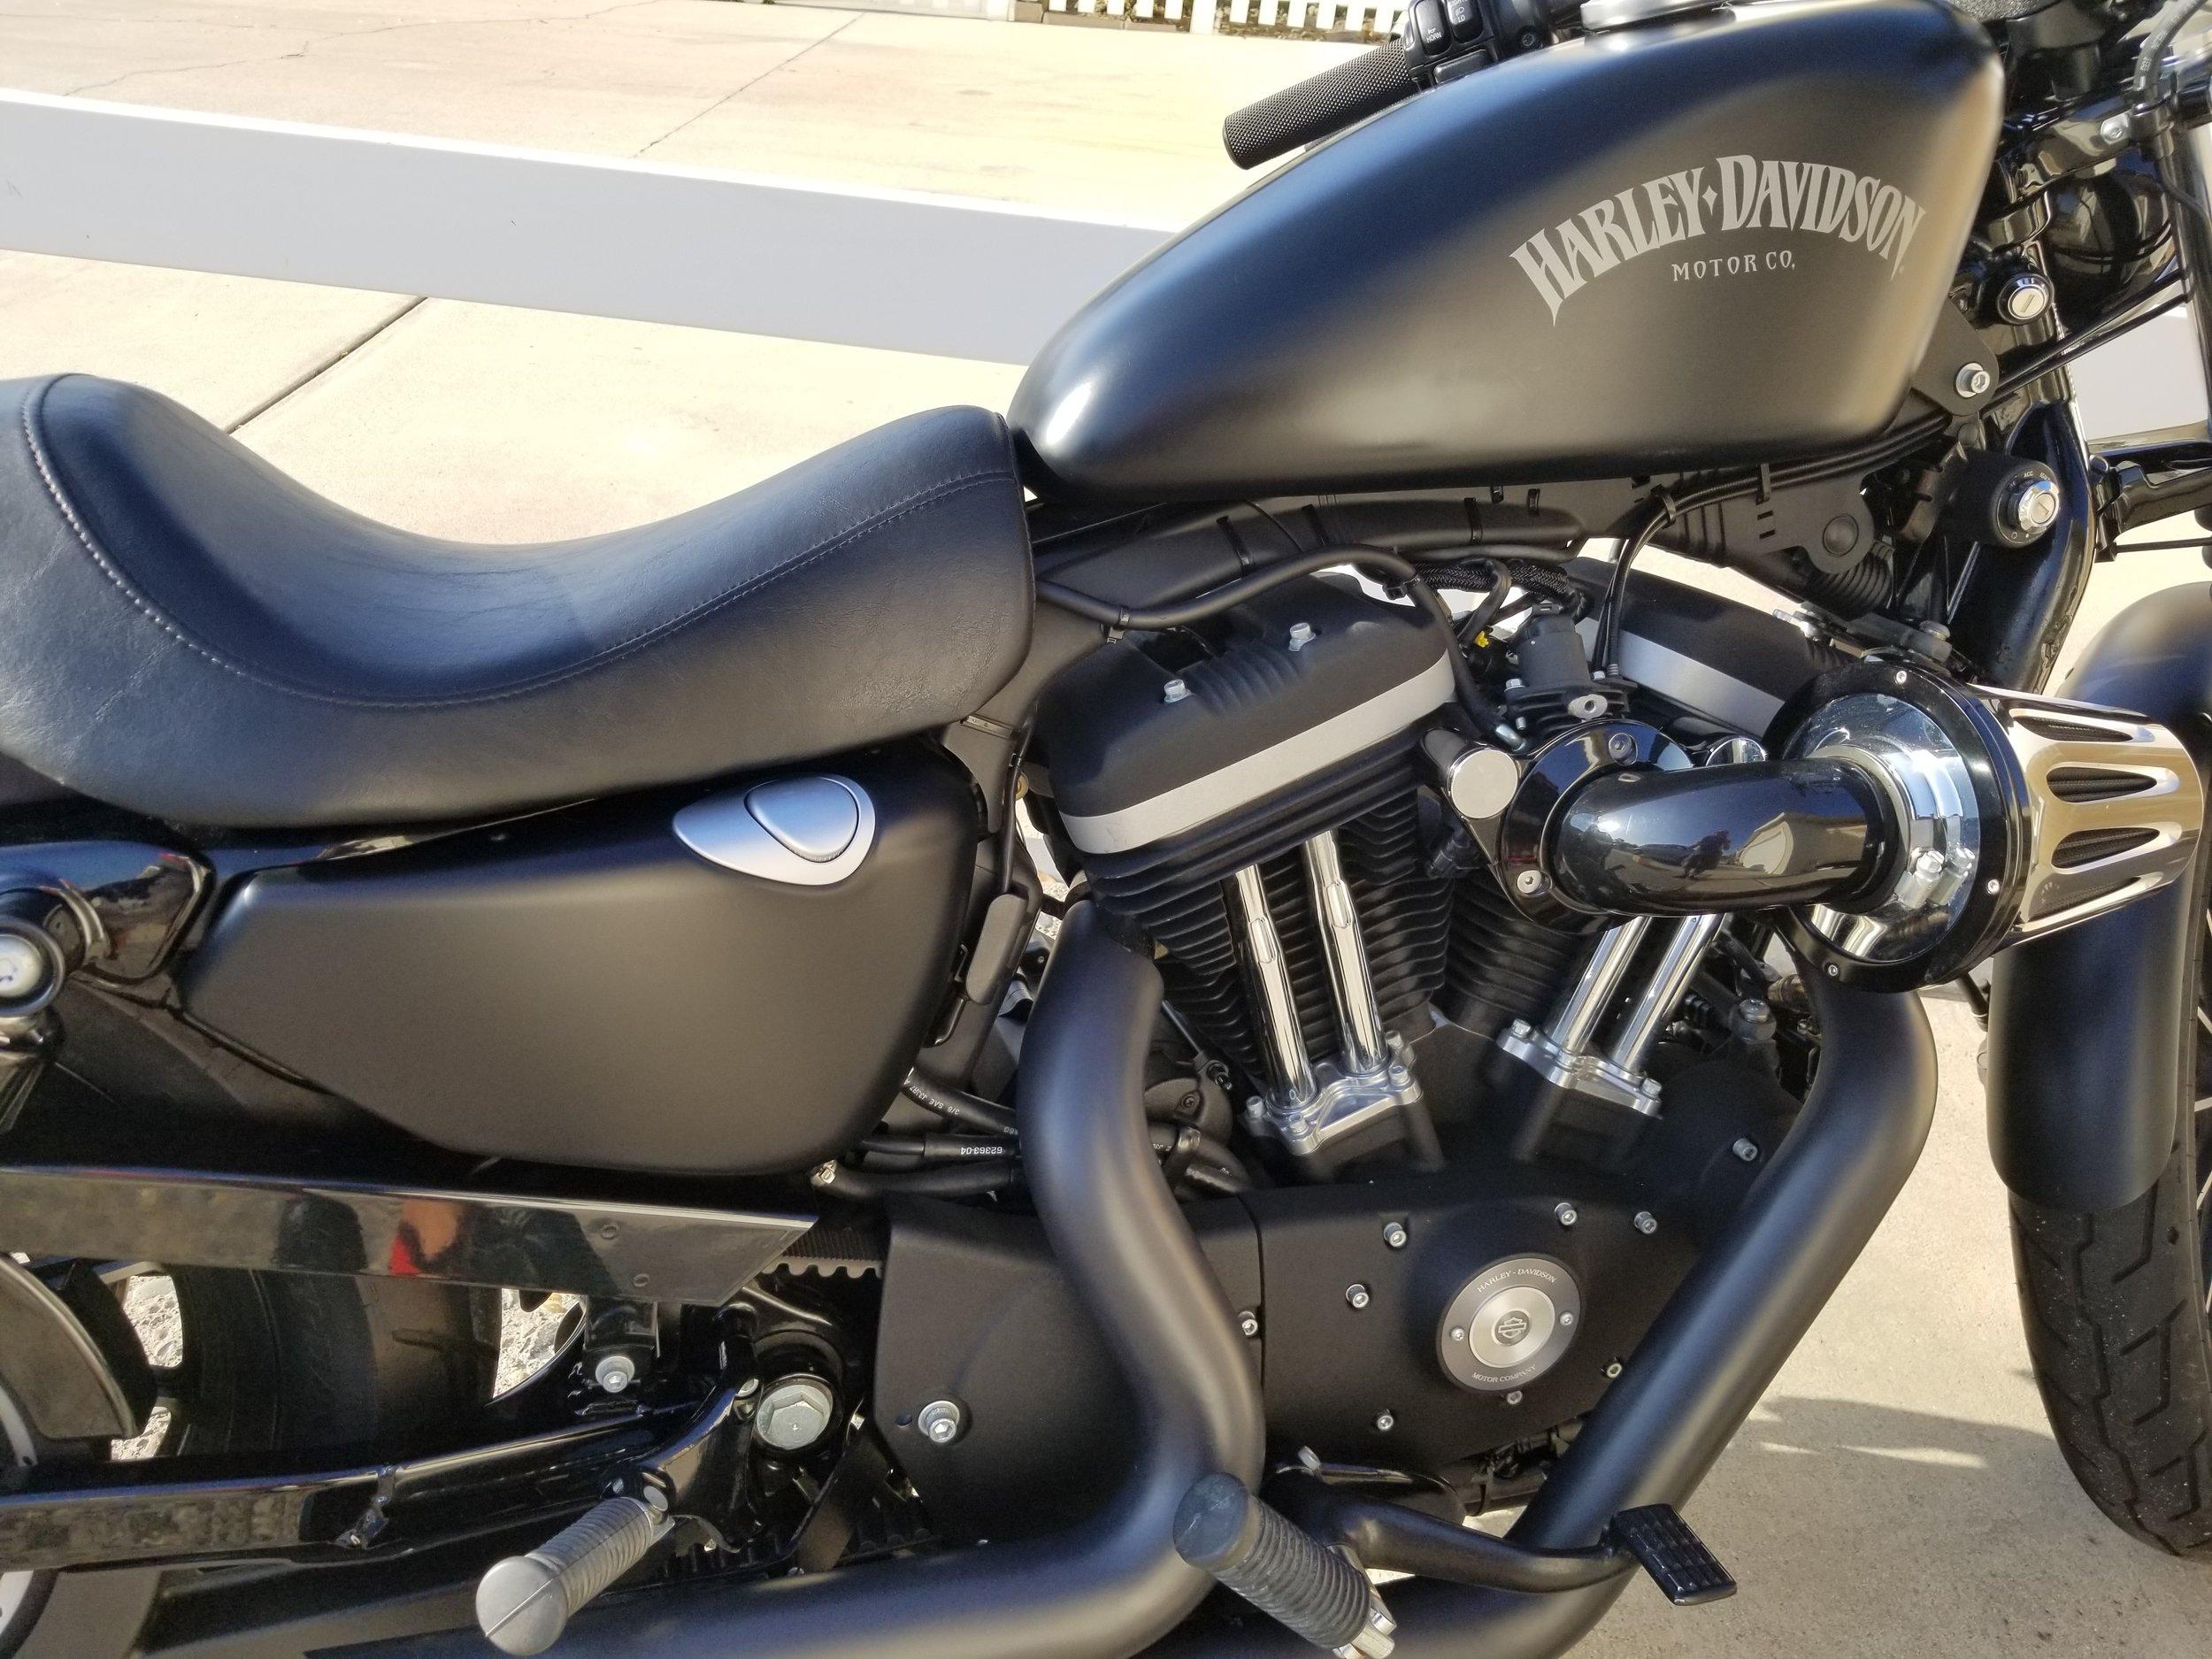 Harley Davidson-2.jpeg